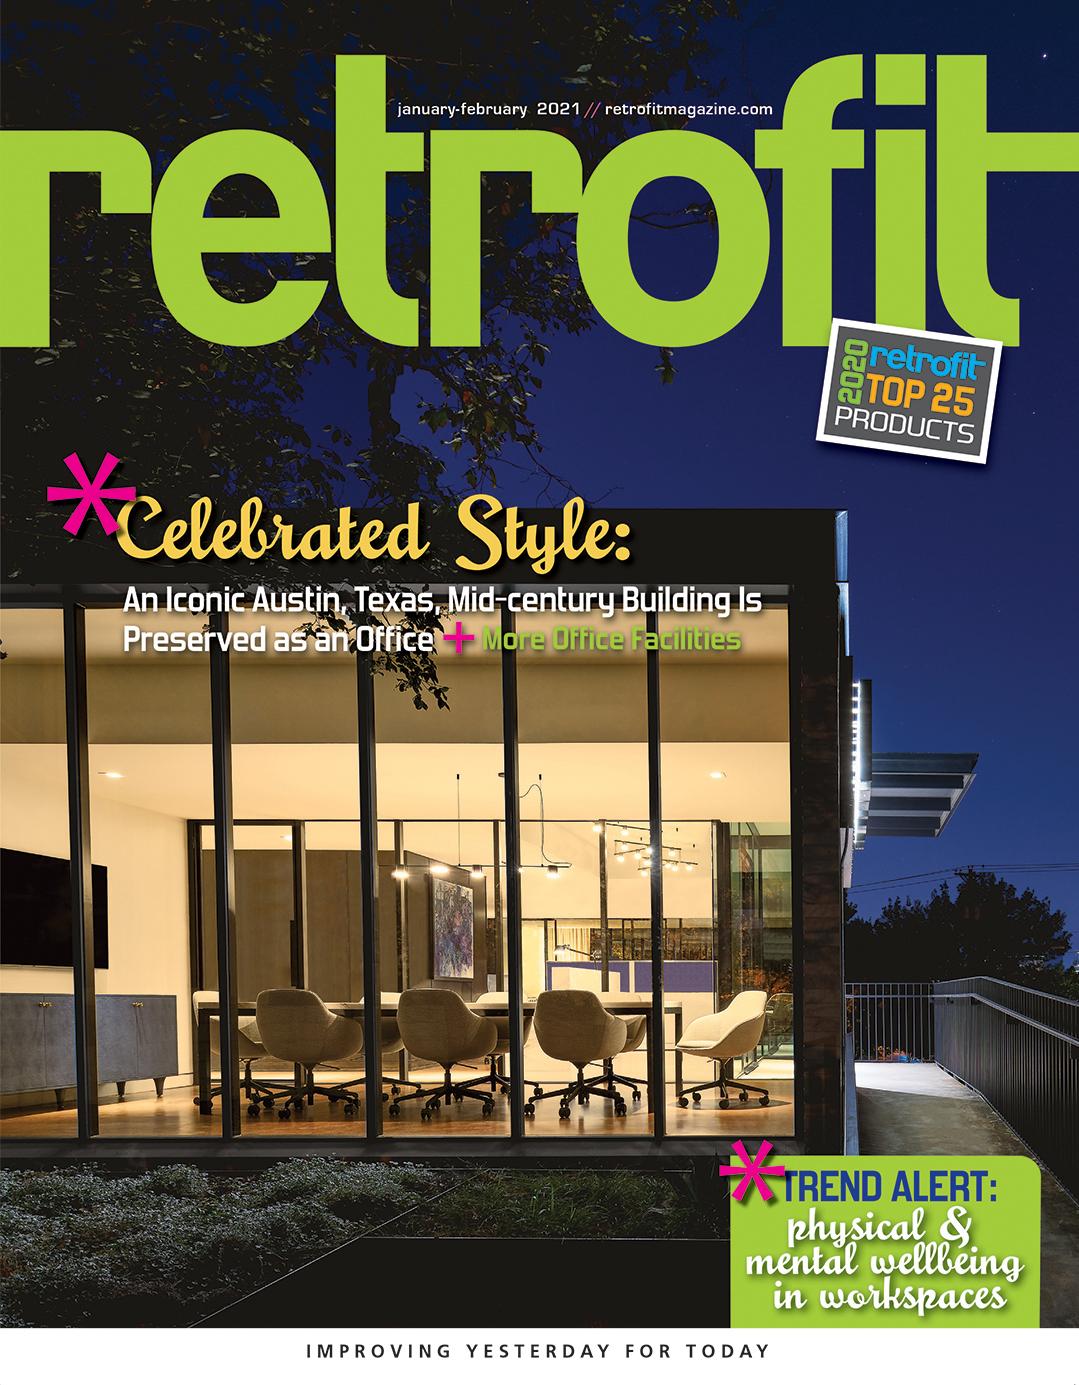 January-February 2021 issue